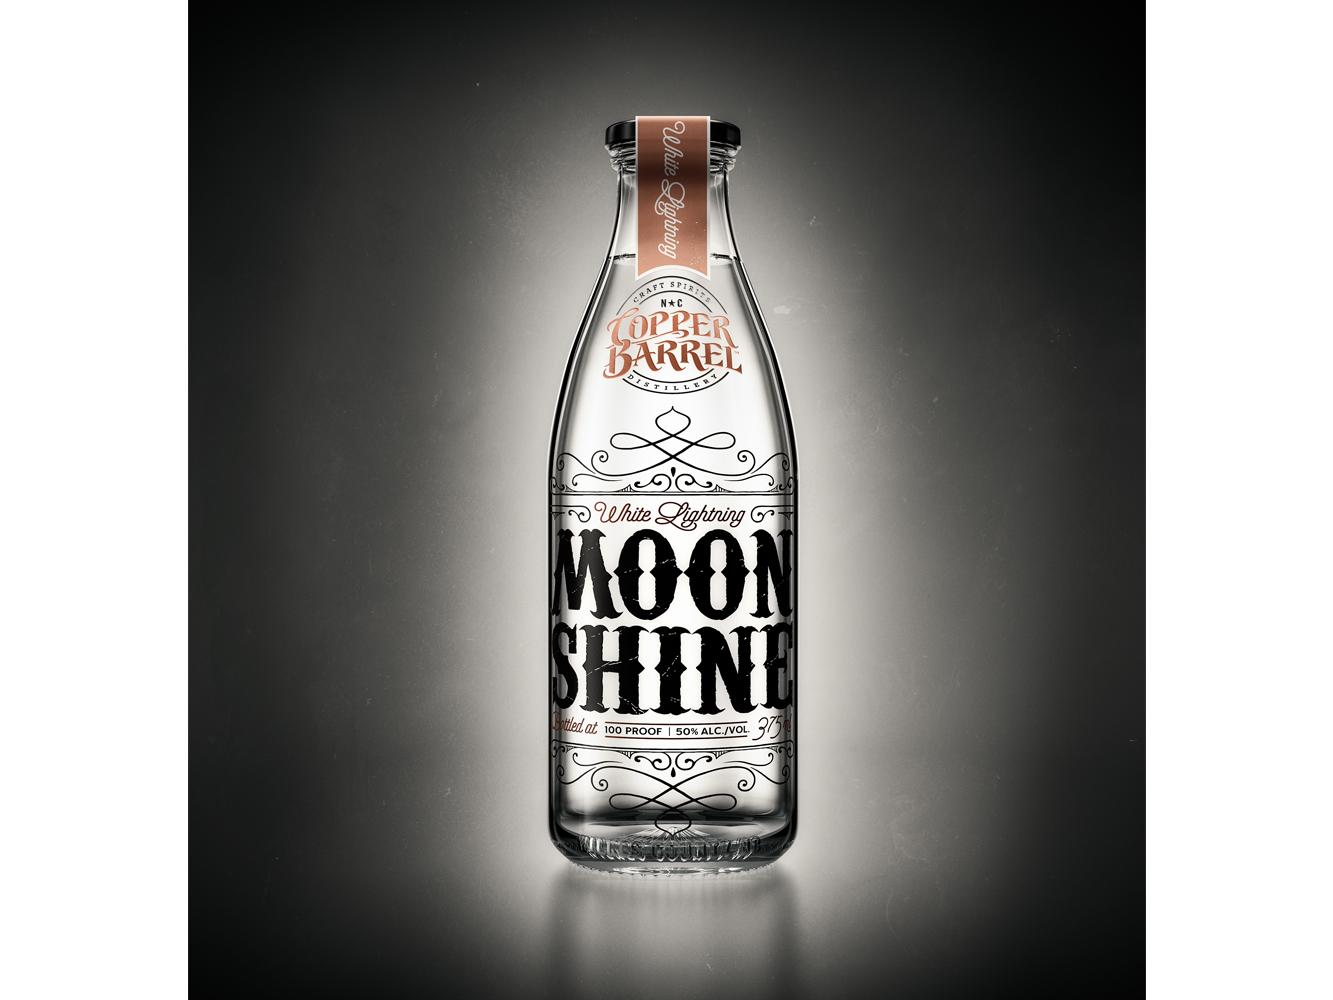 pix-us-moonshine-bottle